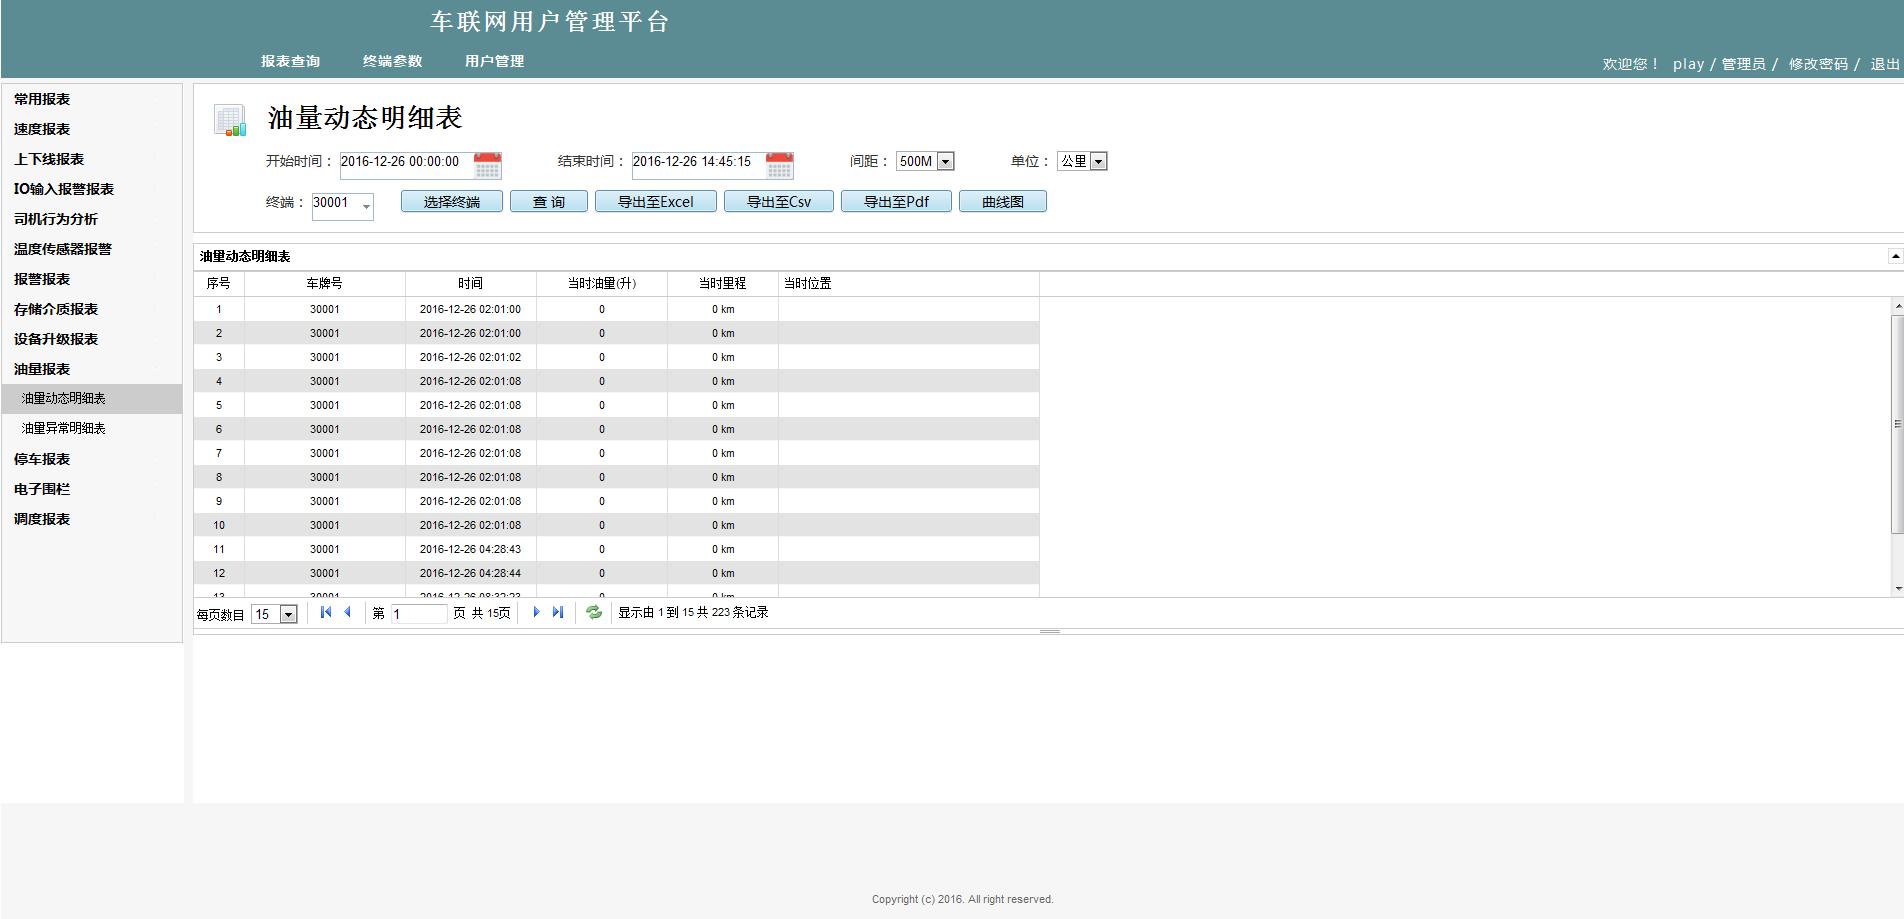 IVMS WEB客户端——智能车辆管理系统平台 第10张